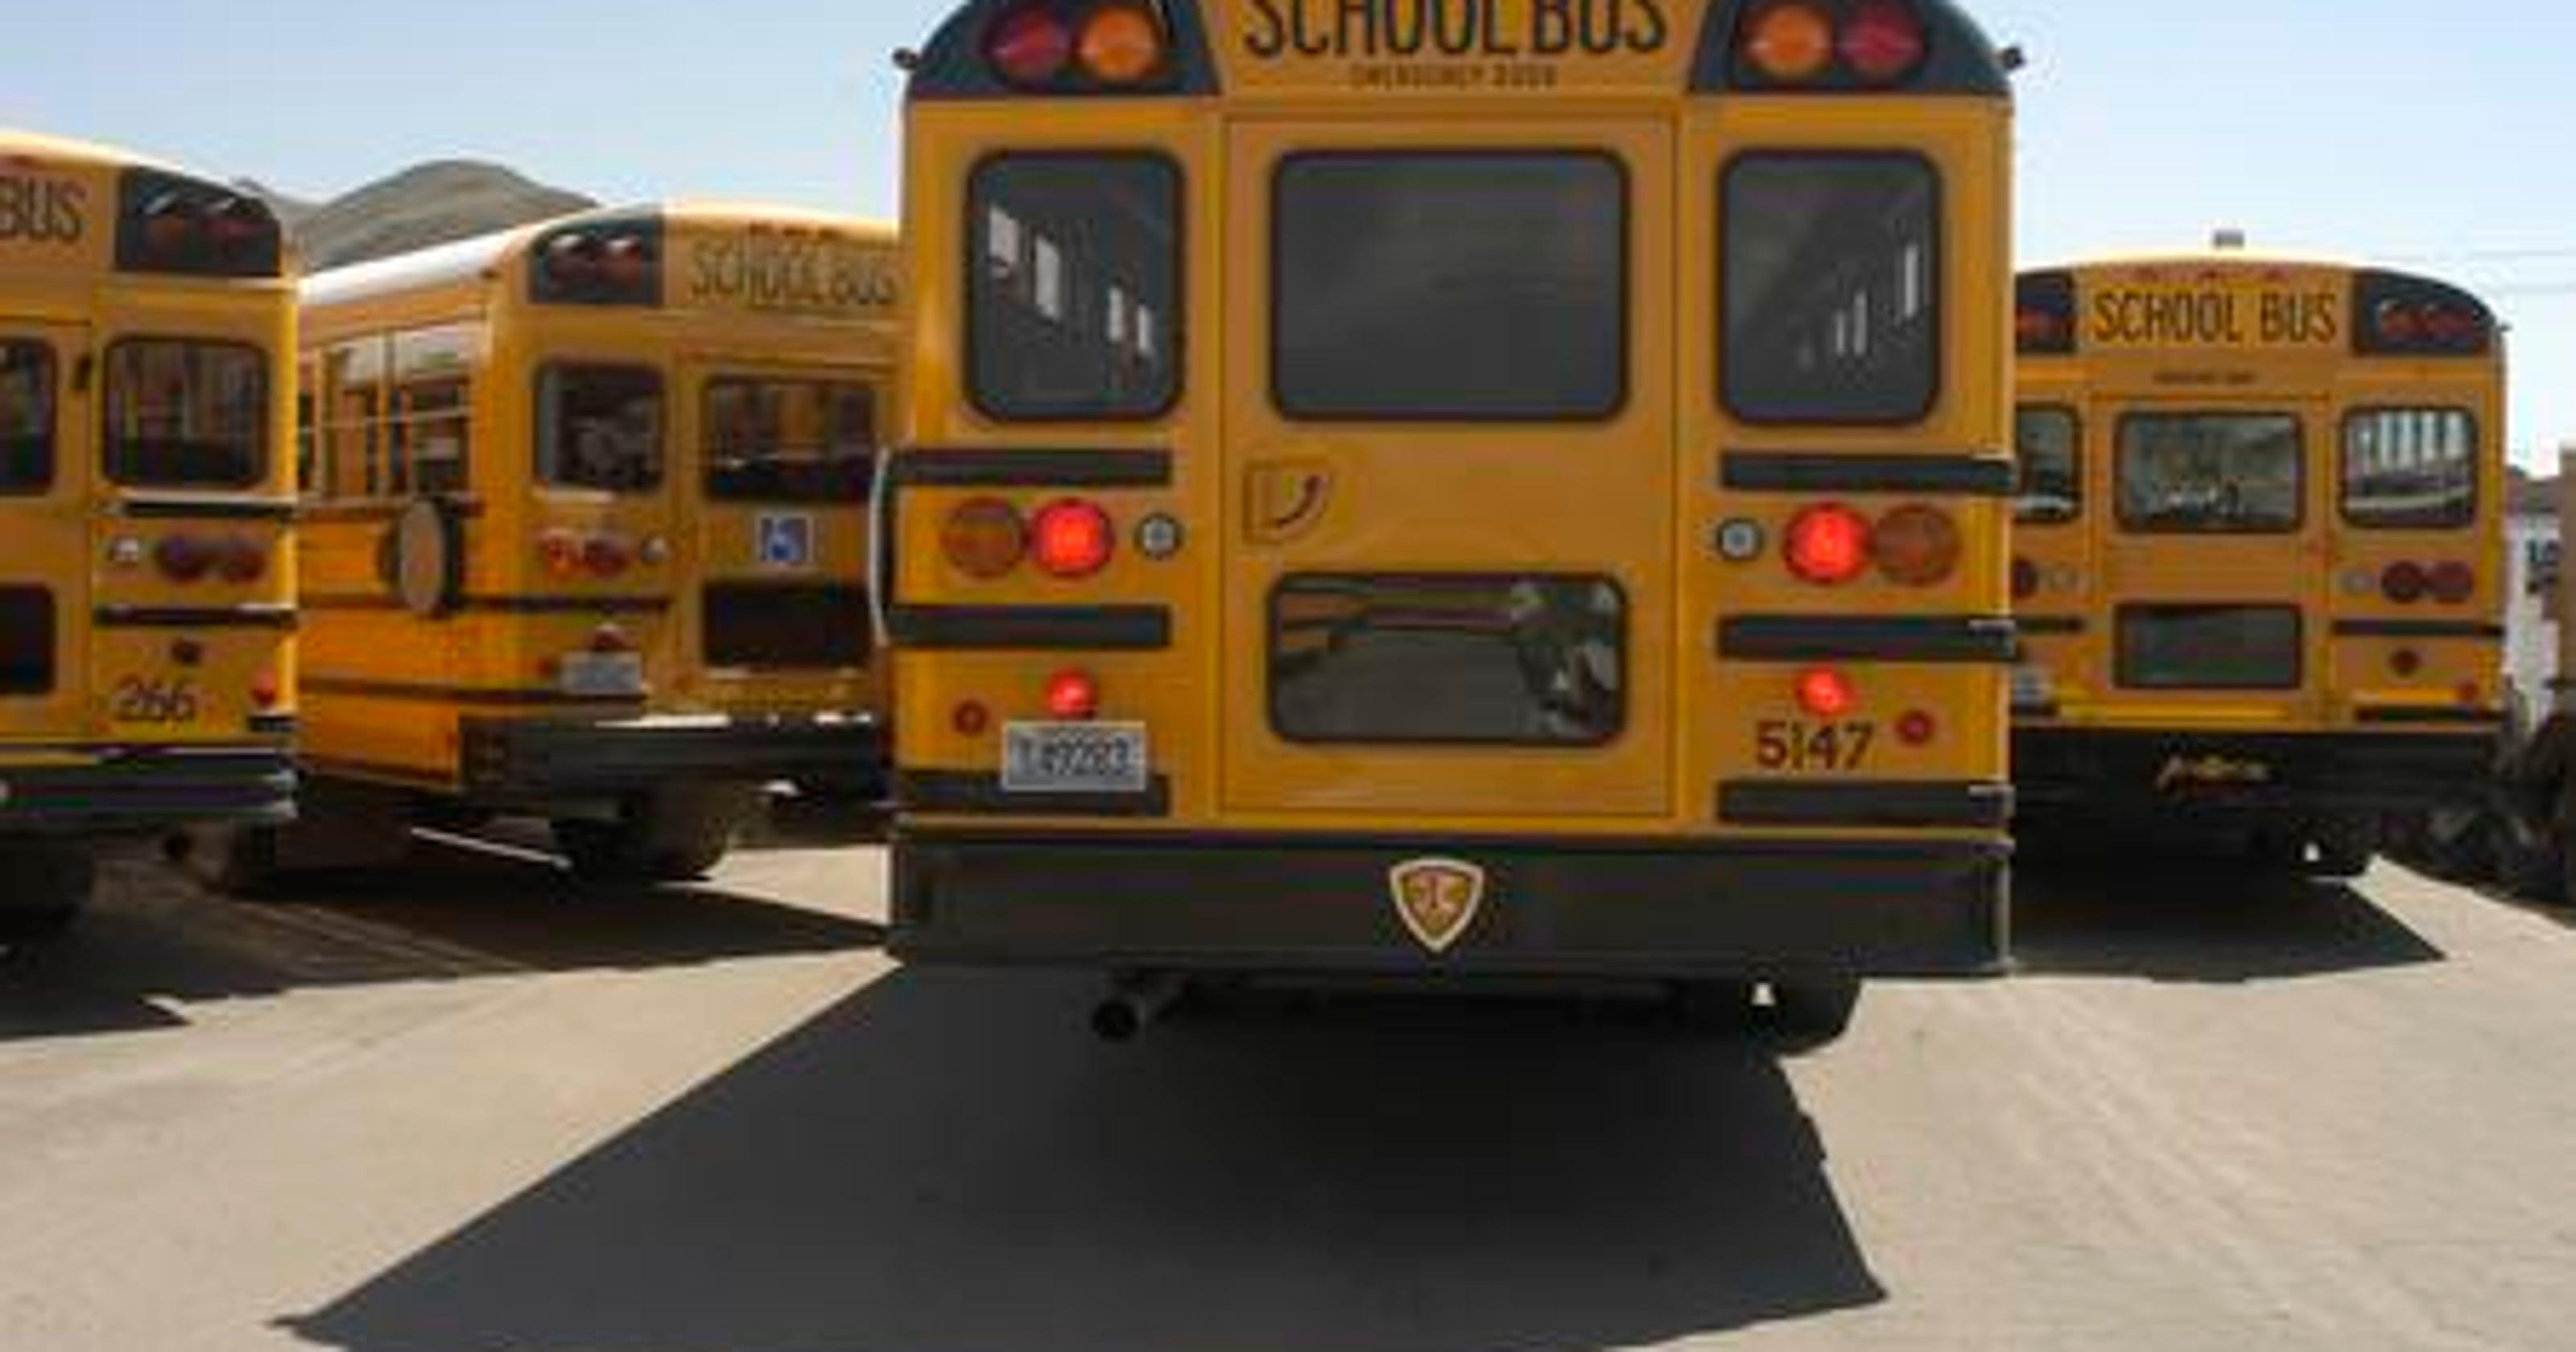 Kindergarten Registration Starts For The 2014 2015 School Year In